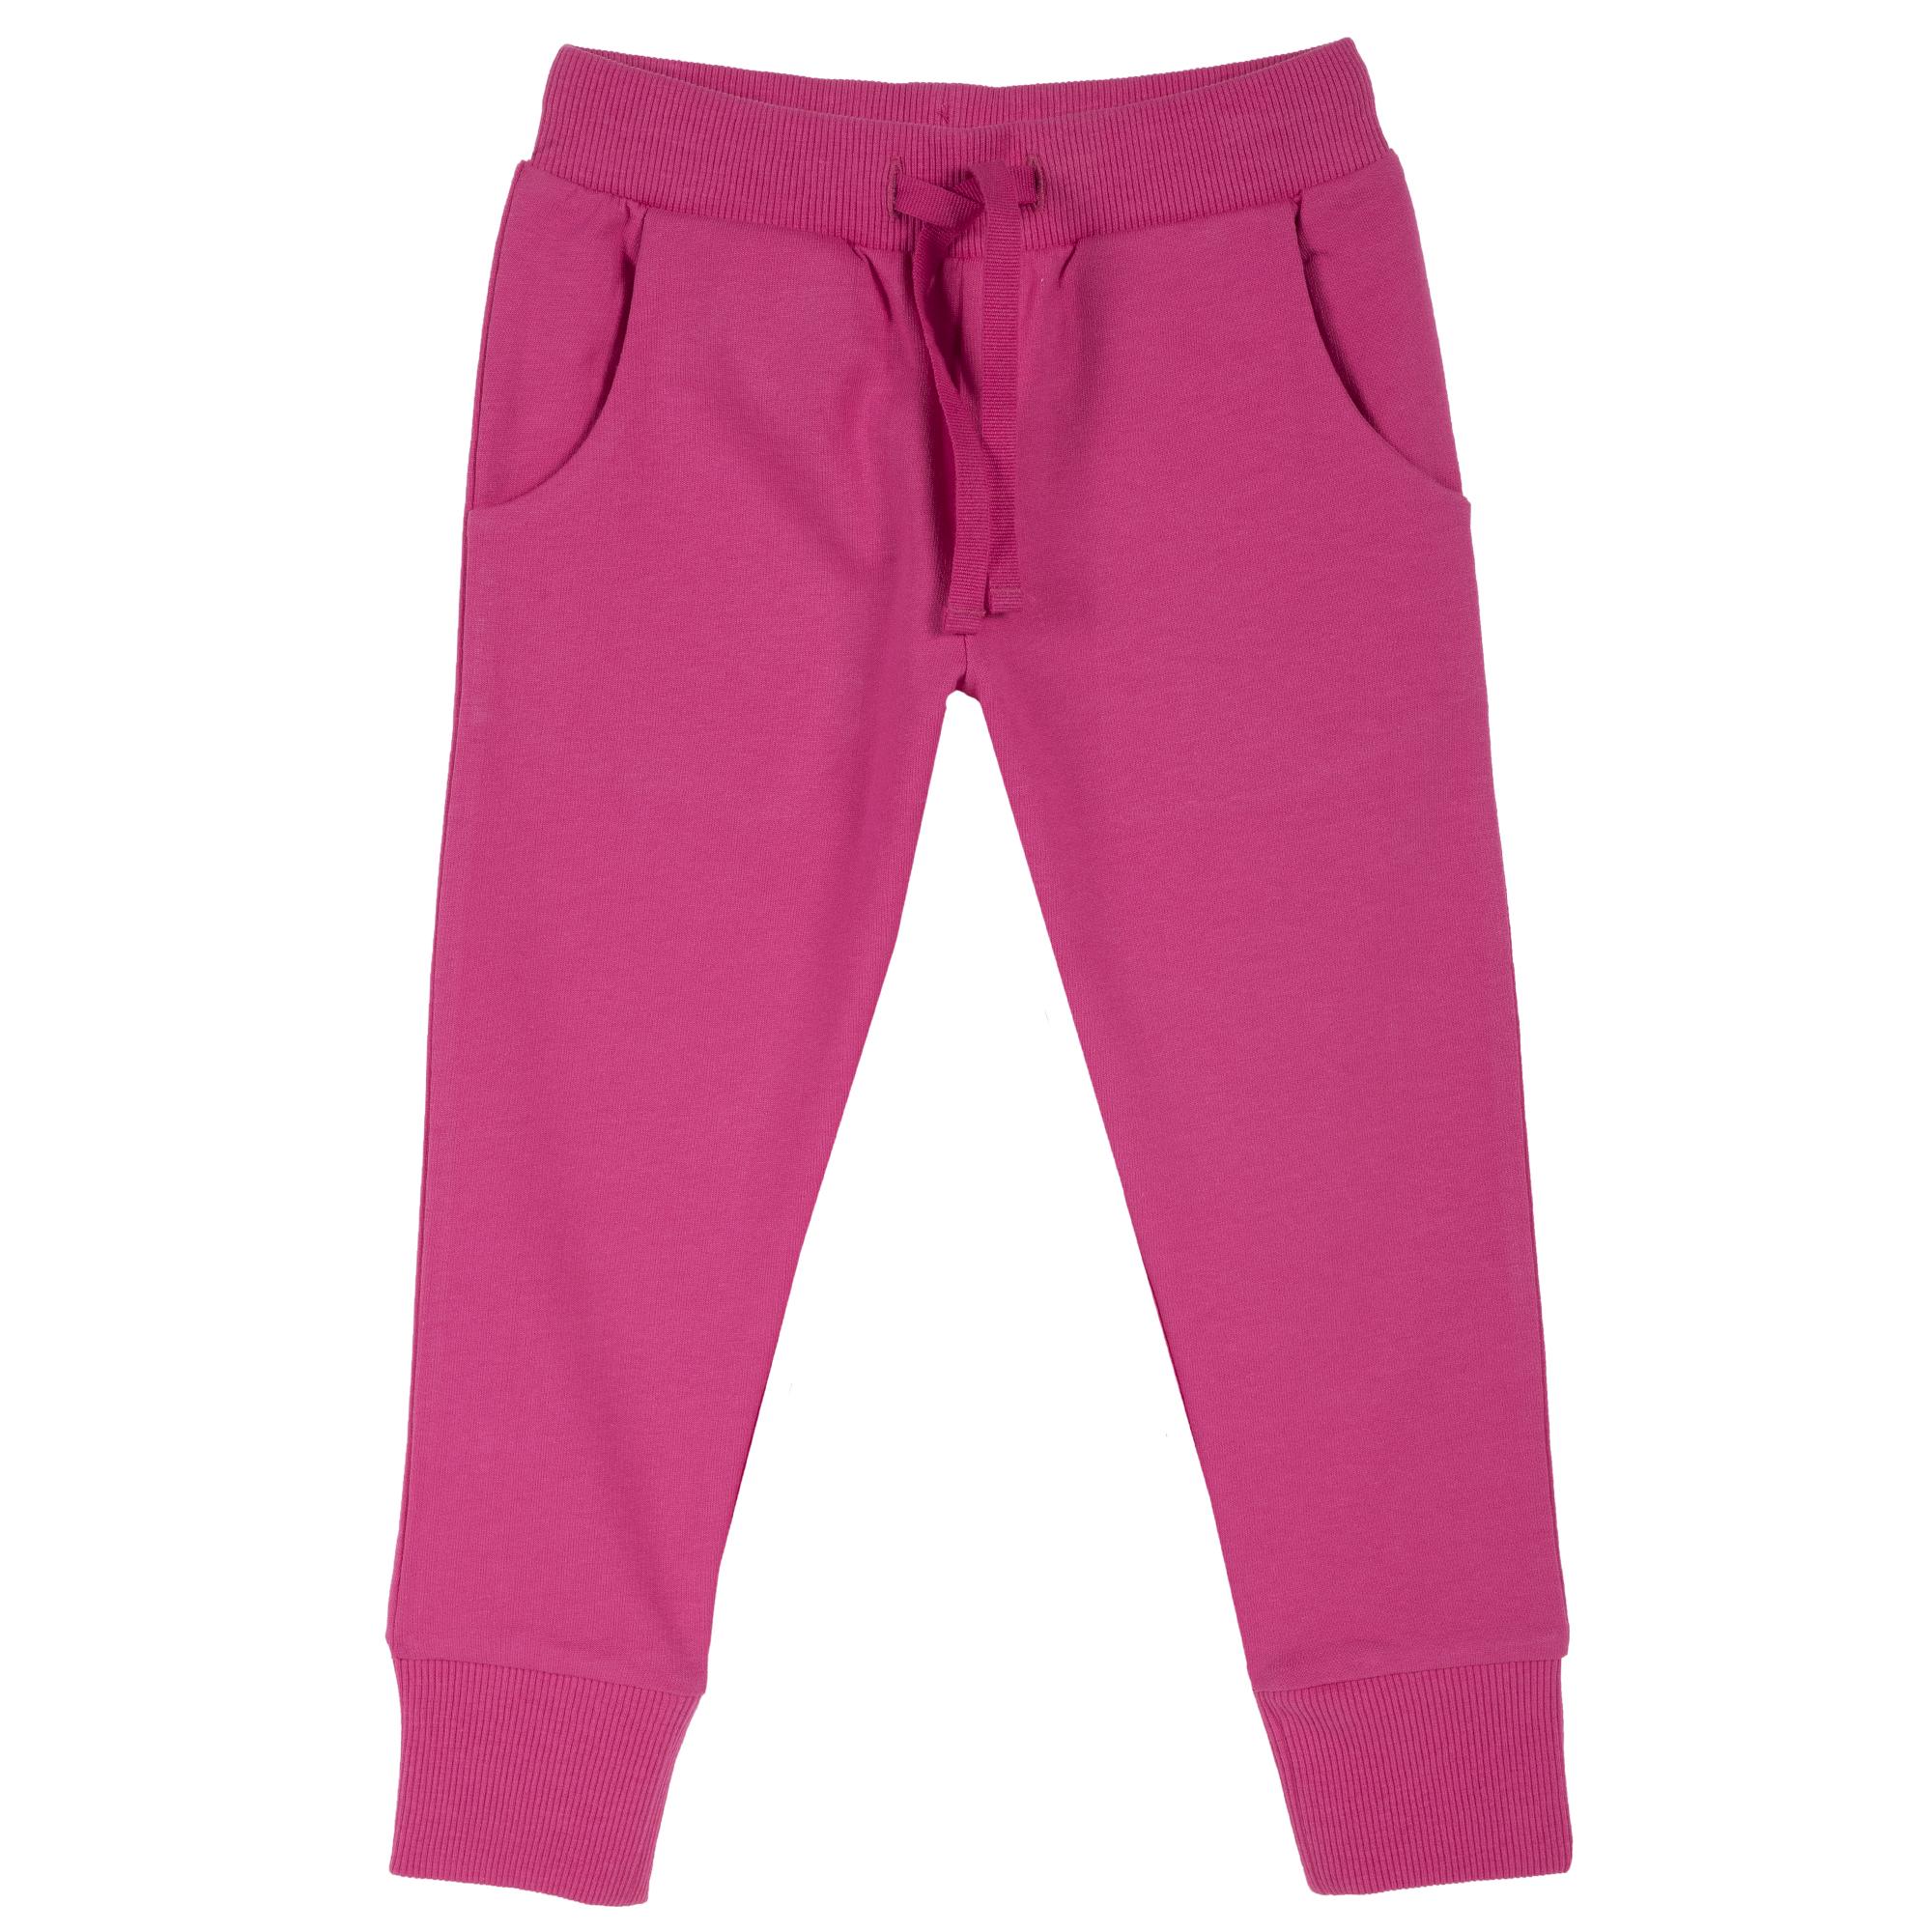 Pantalon trening copii Chicco, manseta elastica, corai, 24932 din categoria Pantaloni copii